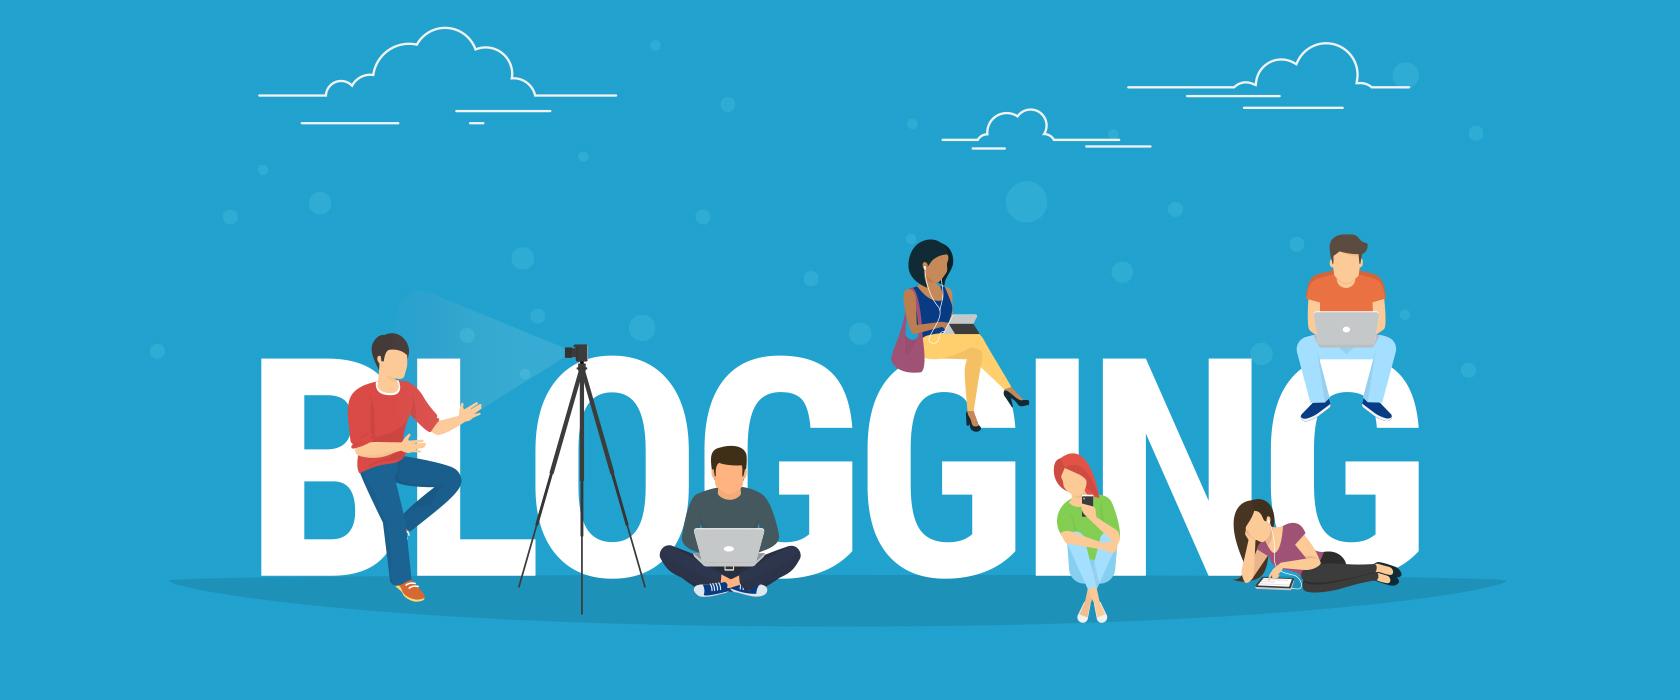 5 ways to automatically improve blog posts sage island